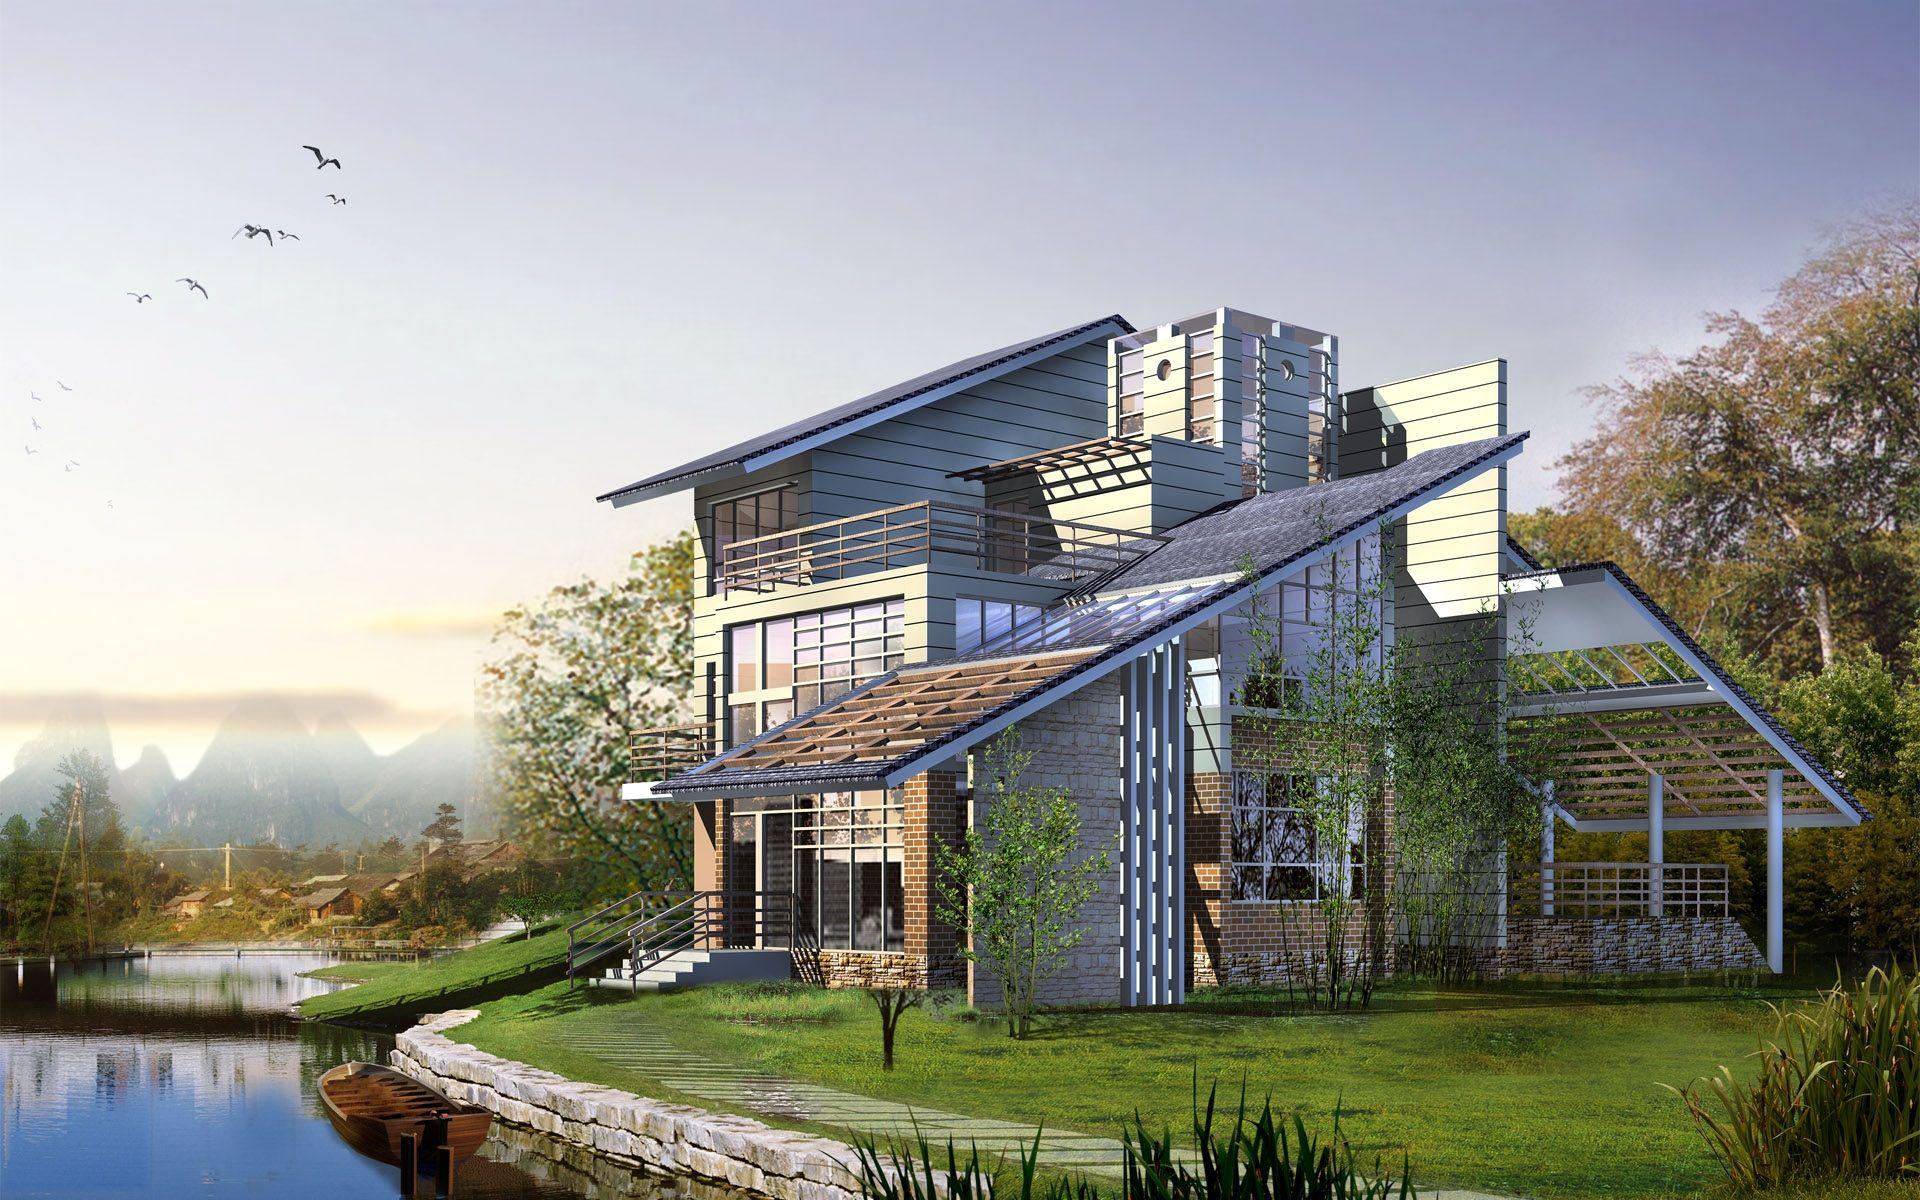 Building Architecture Wallpaper home architecture - pueblosinfronteras